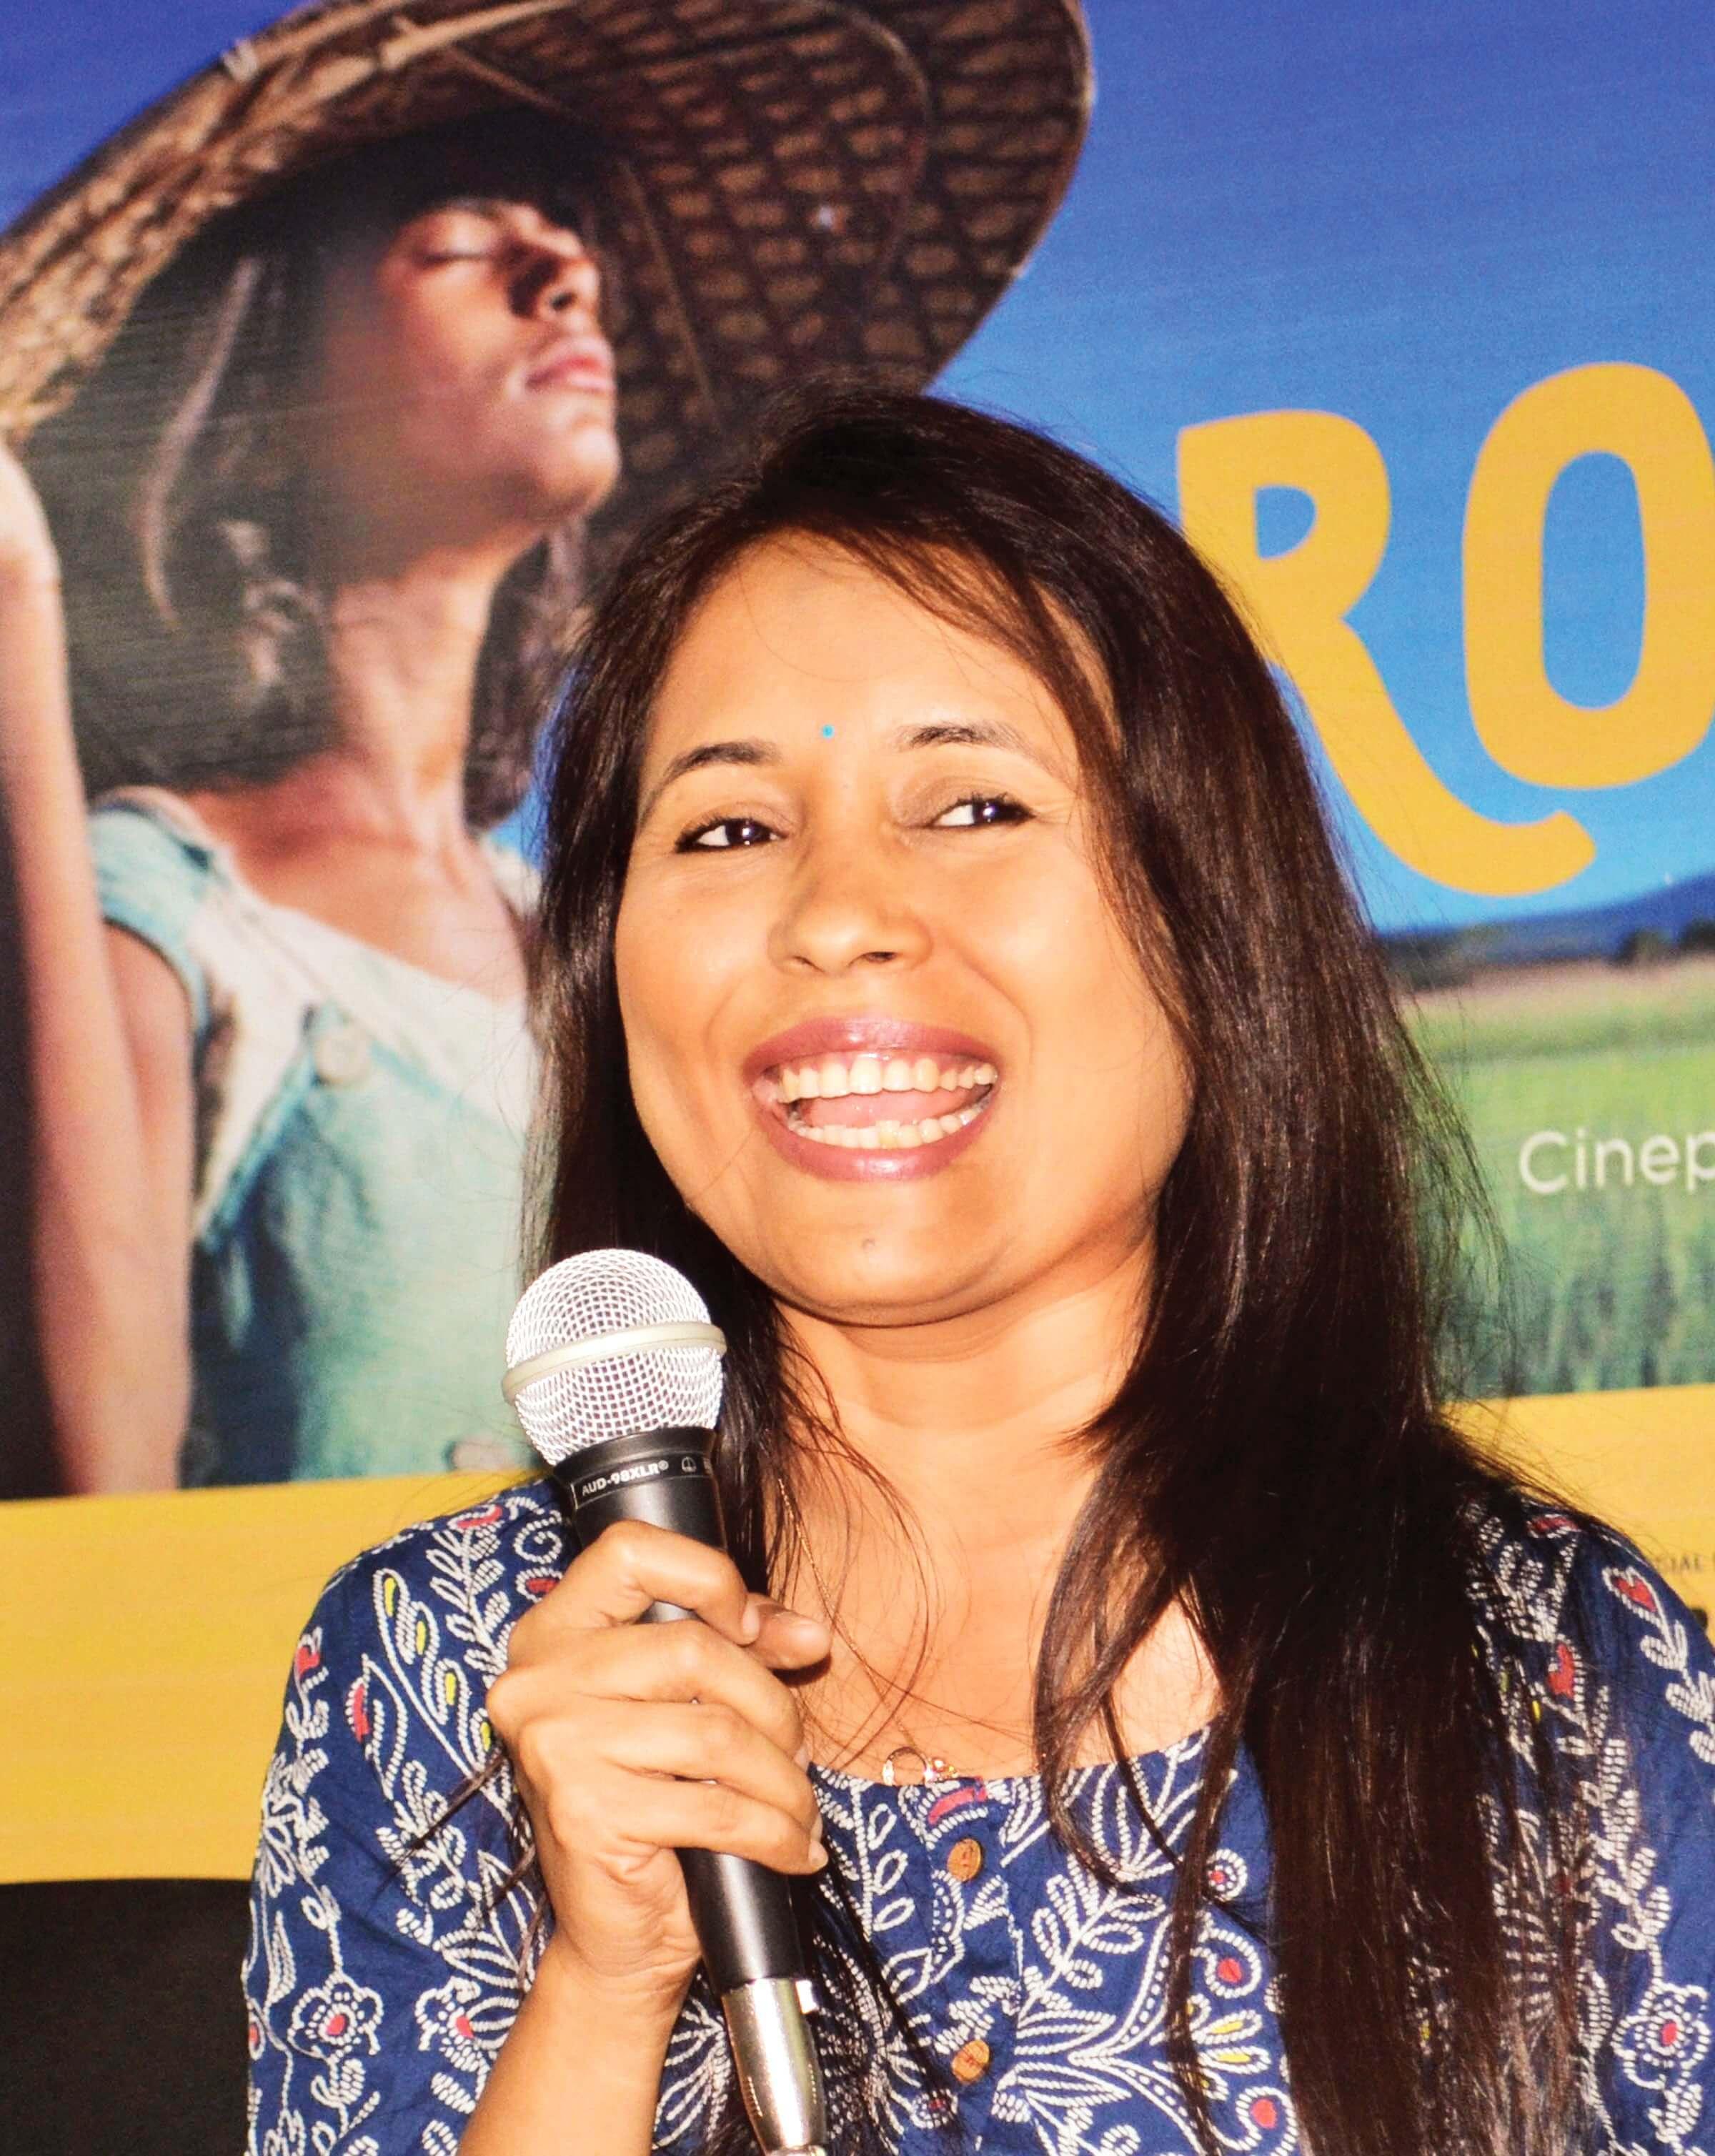 Rs 50 lakh not enough to promote Village Rockstars: Rima Das